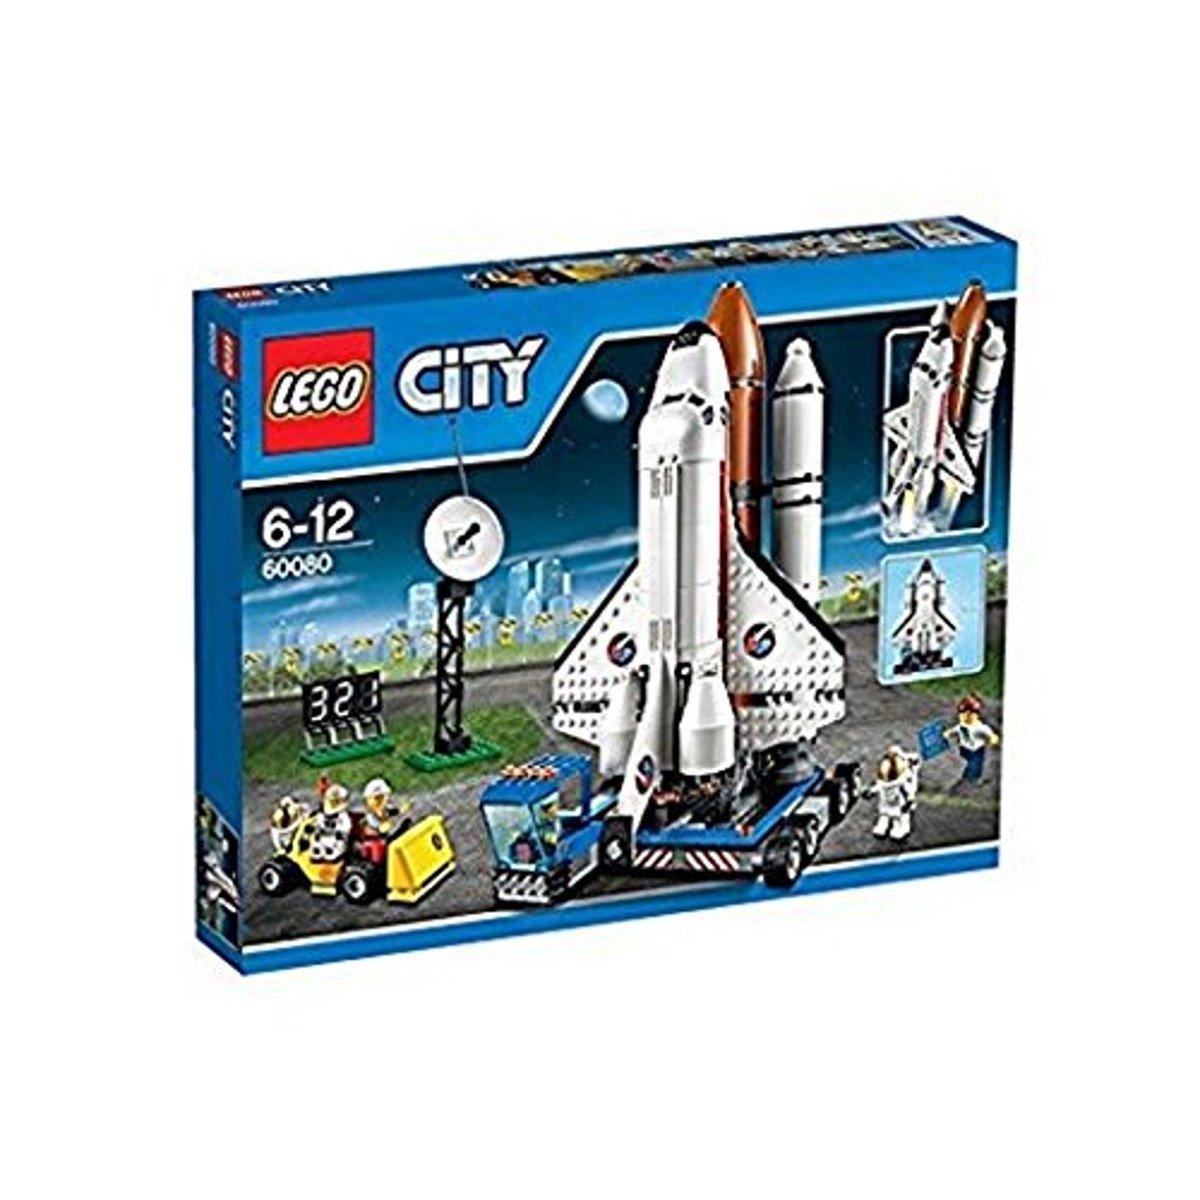 Raumschiff Spielzeug - Lego City 60080 Raketenstation